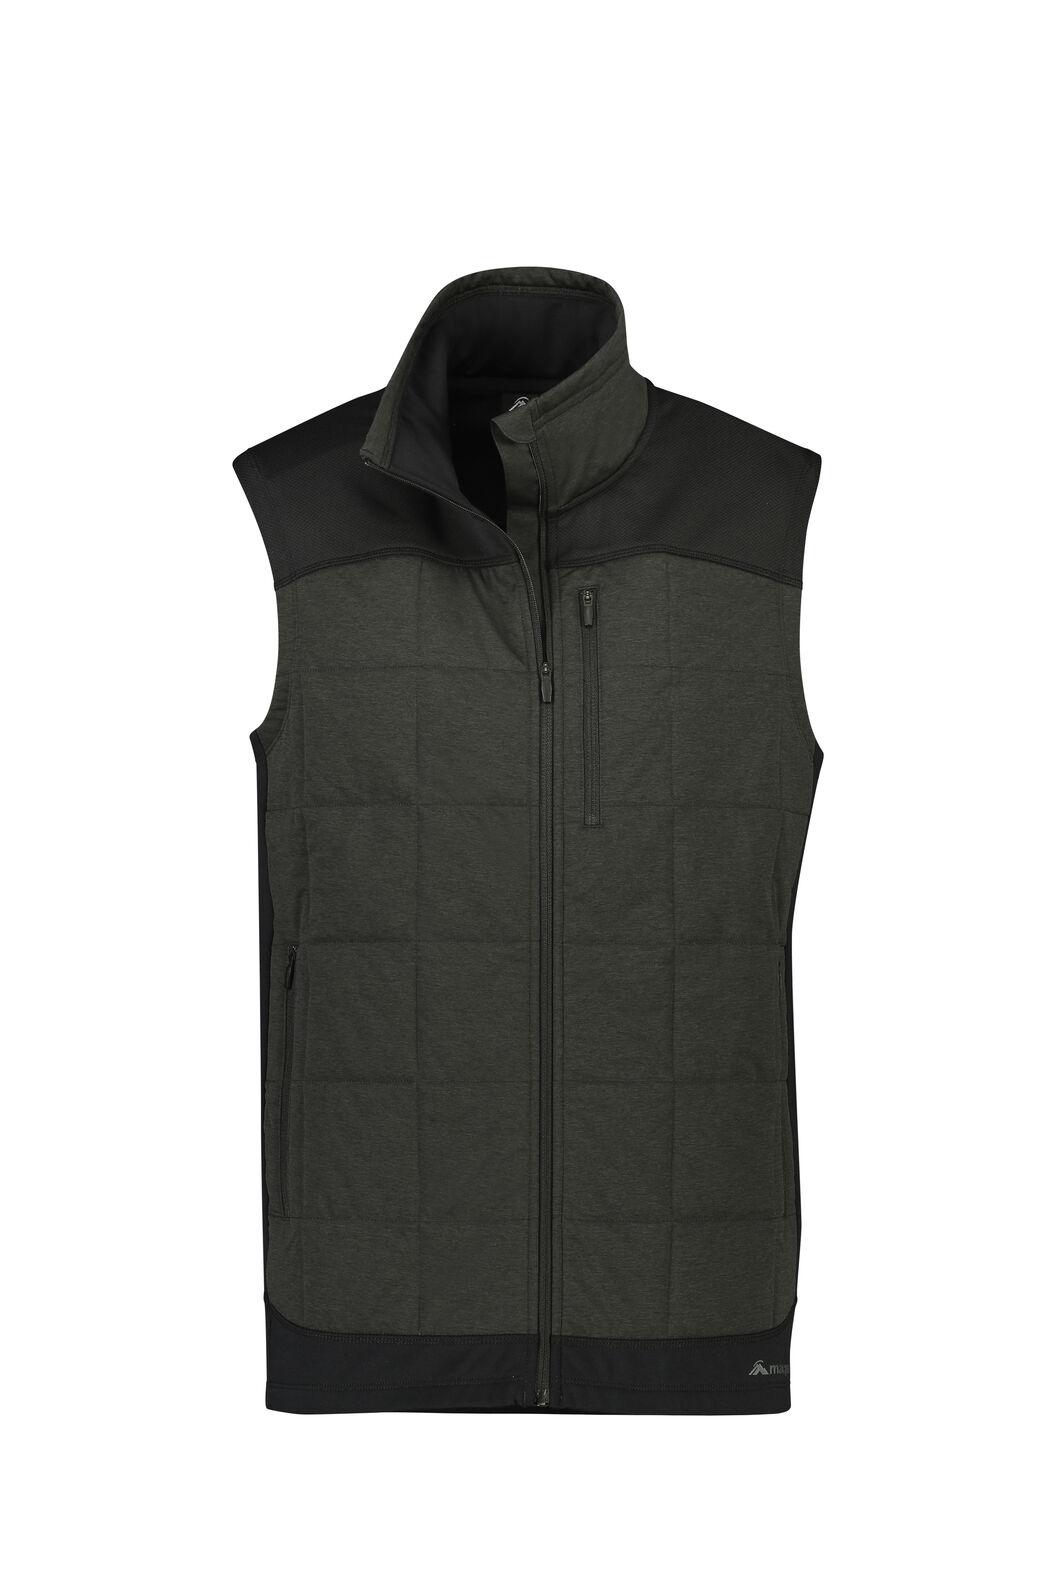 Macpac Accelerate PrimaLoft® Fleece Vest — Men's, Black, hi-res